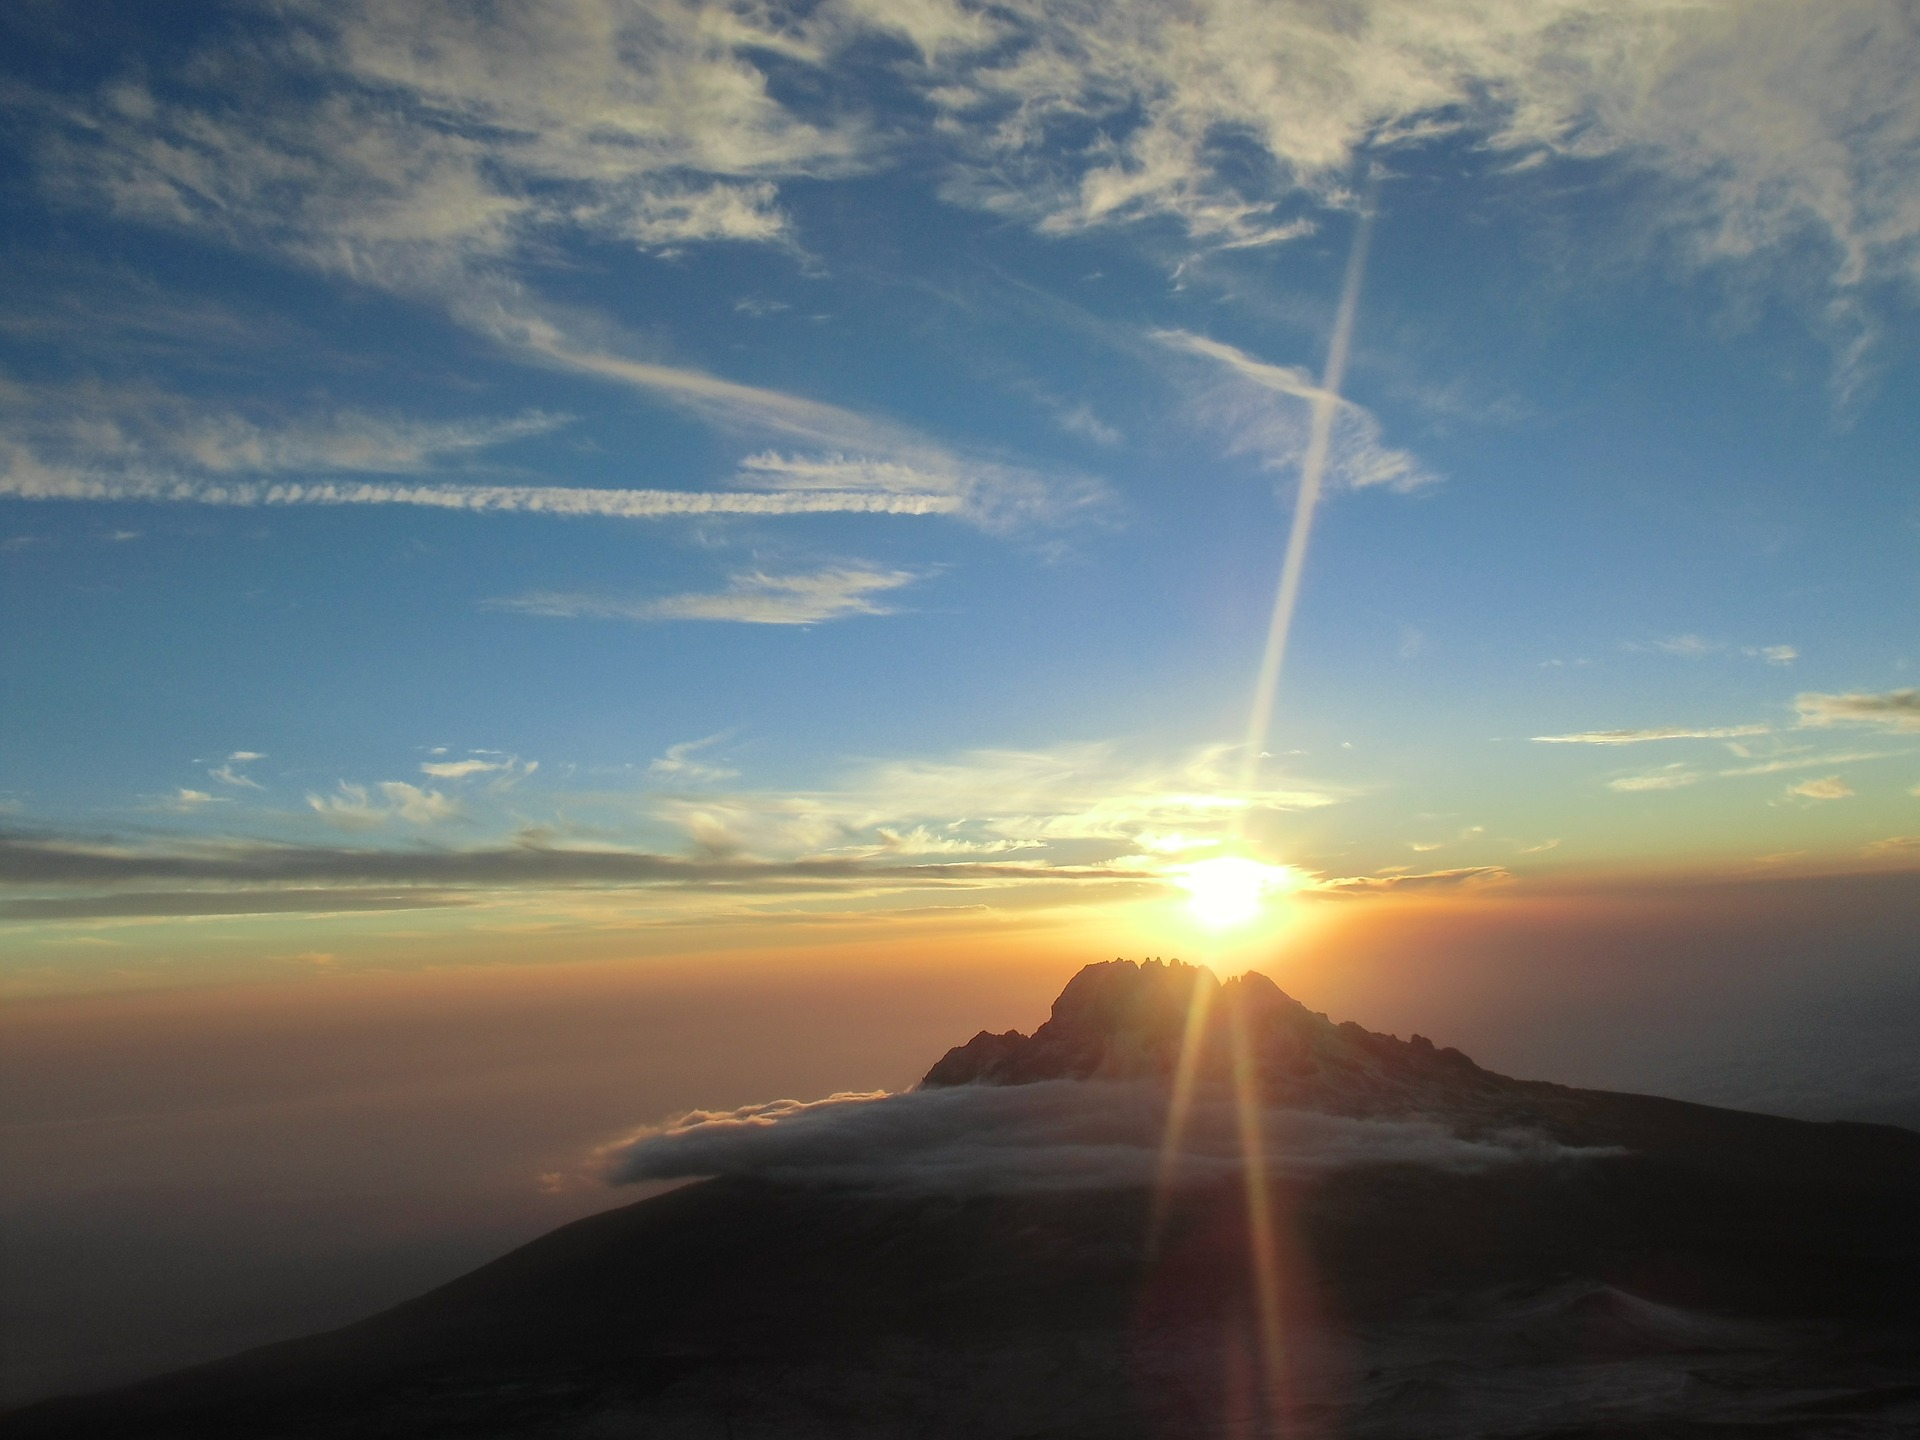 kilimanjaro-574299_1920.jpg